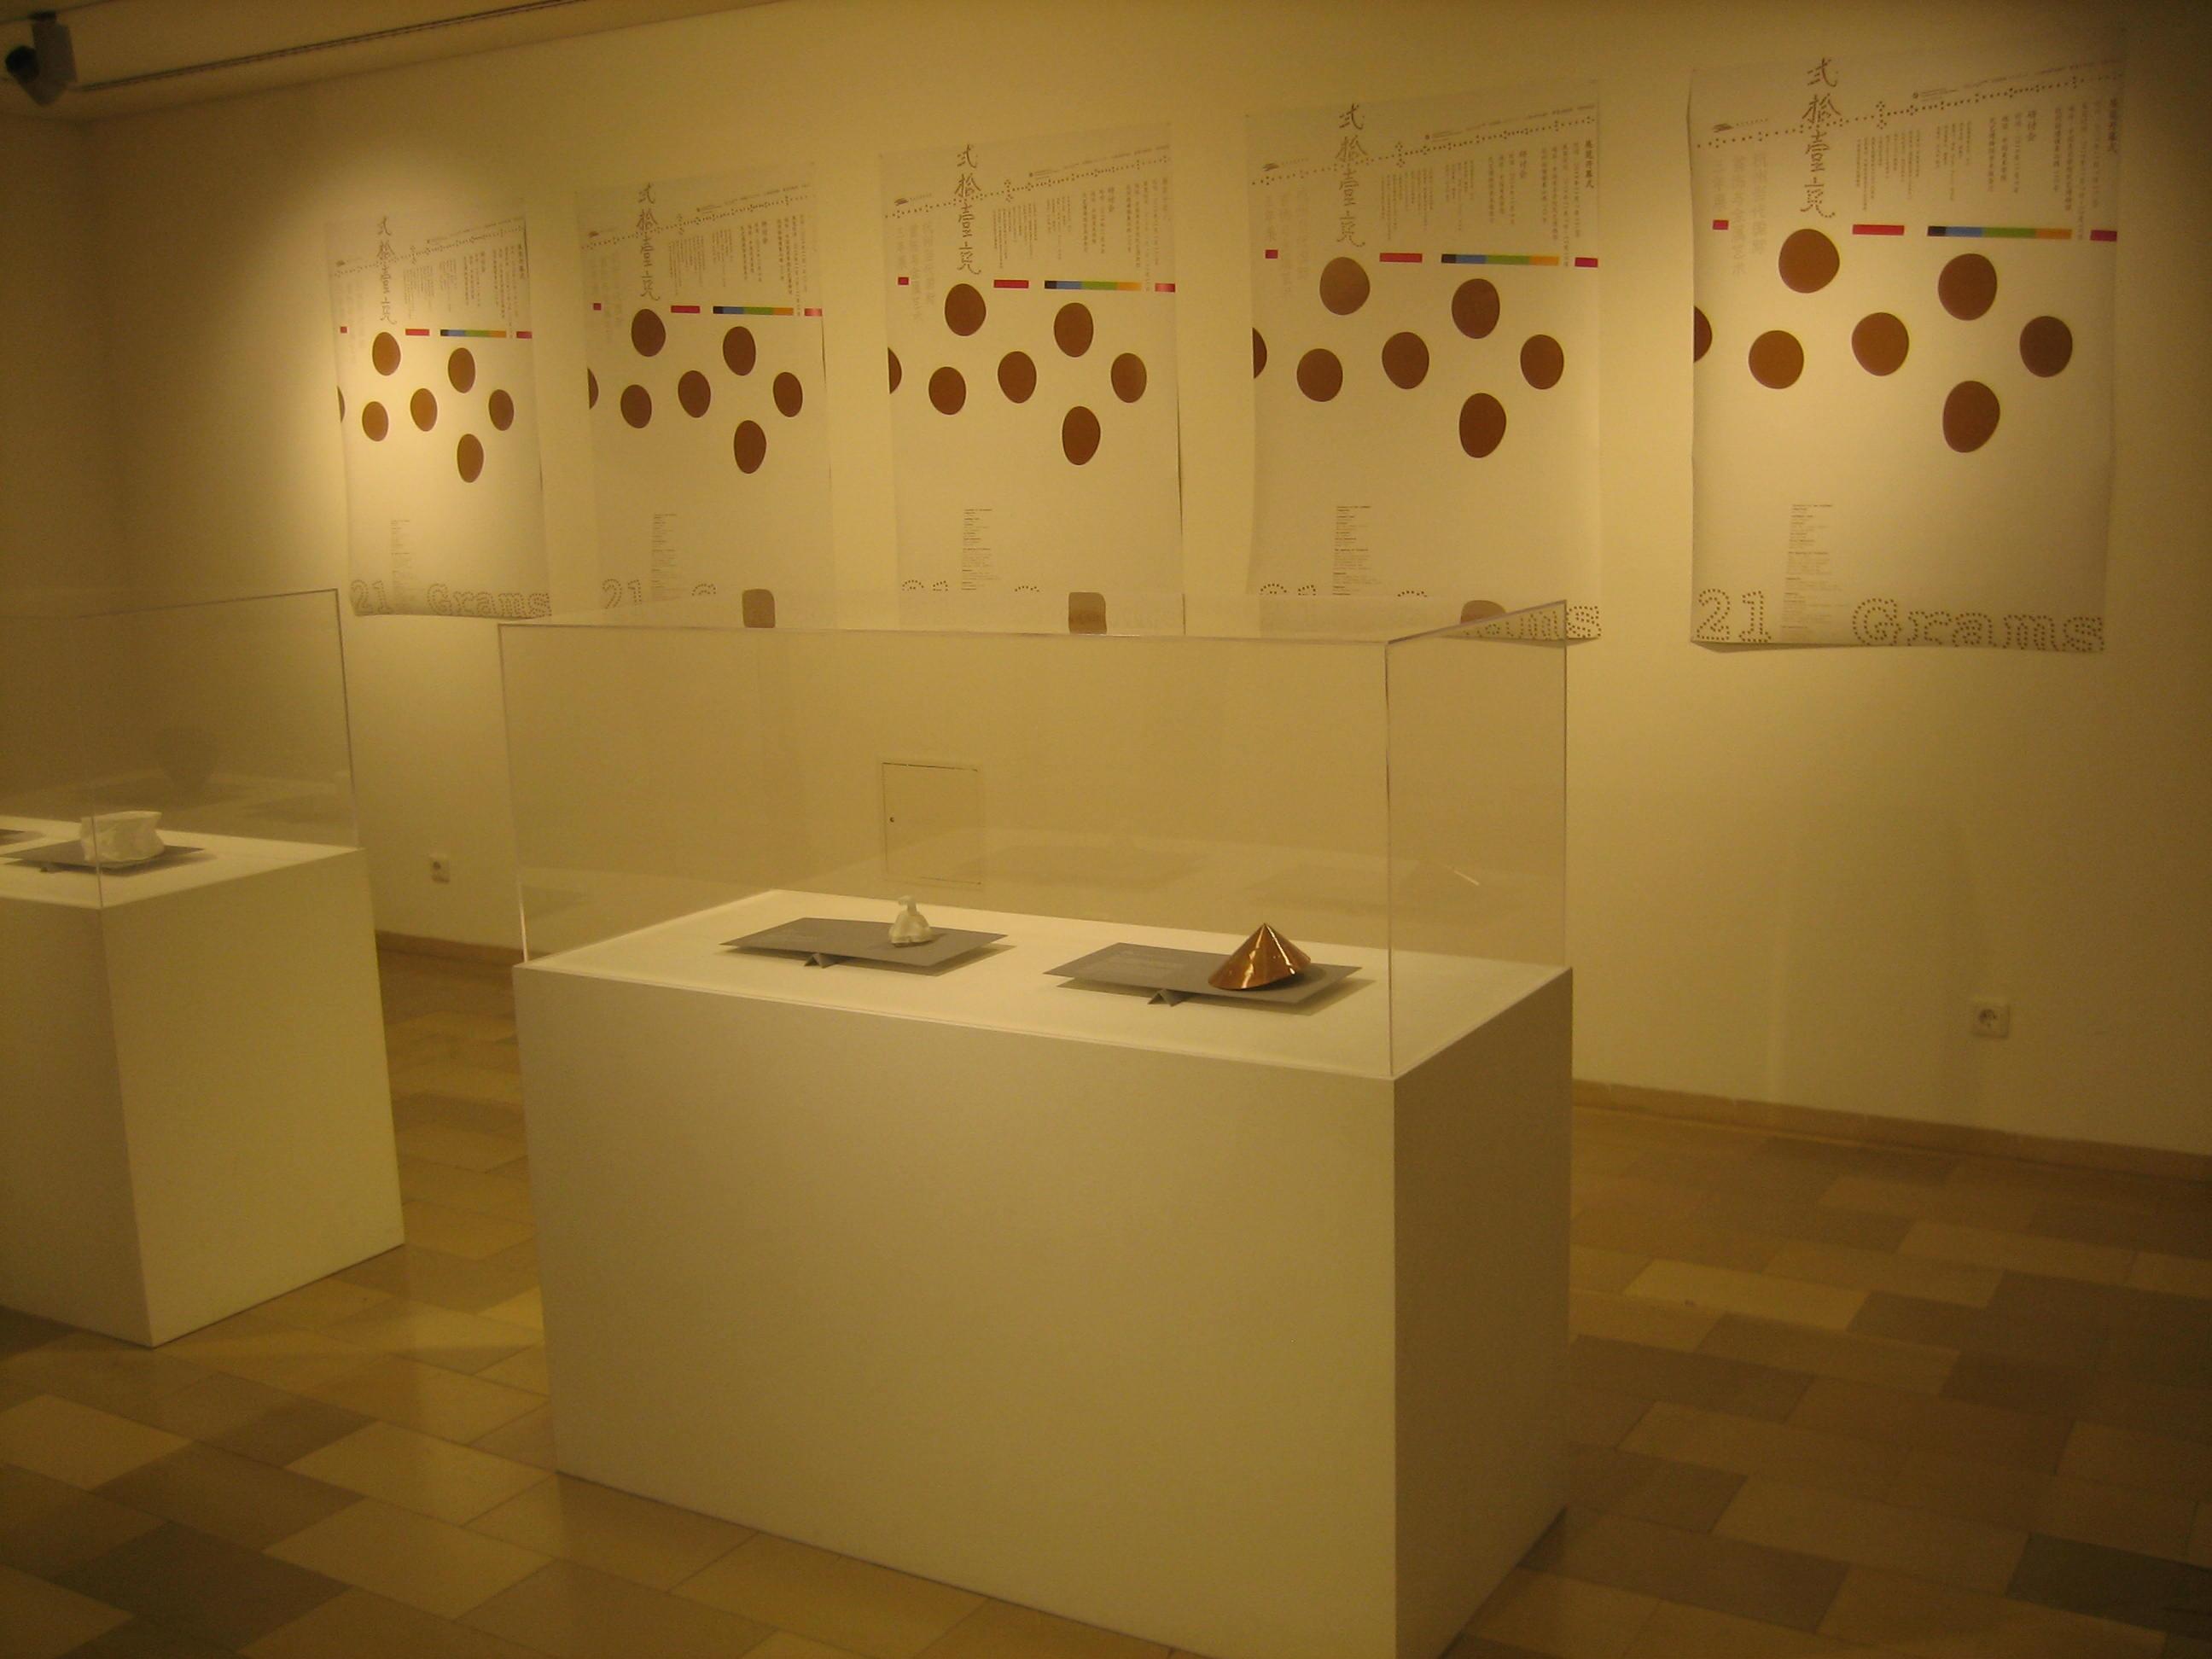 Galerie Handwerk, 21 Grams. Foto Esther Doornbusch, maart 2019 CC BY 4.0